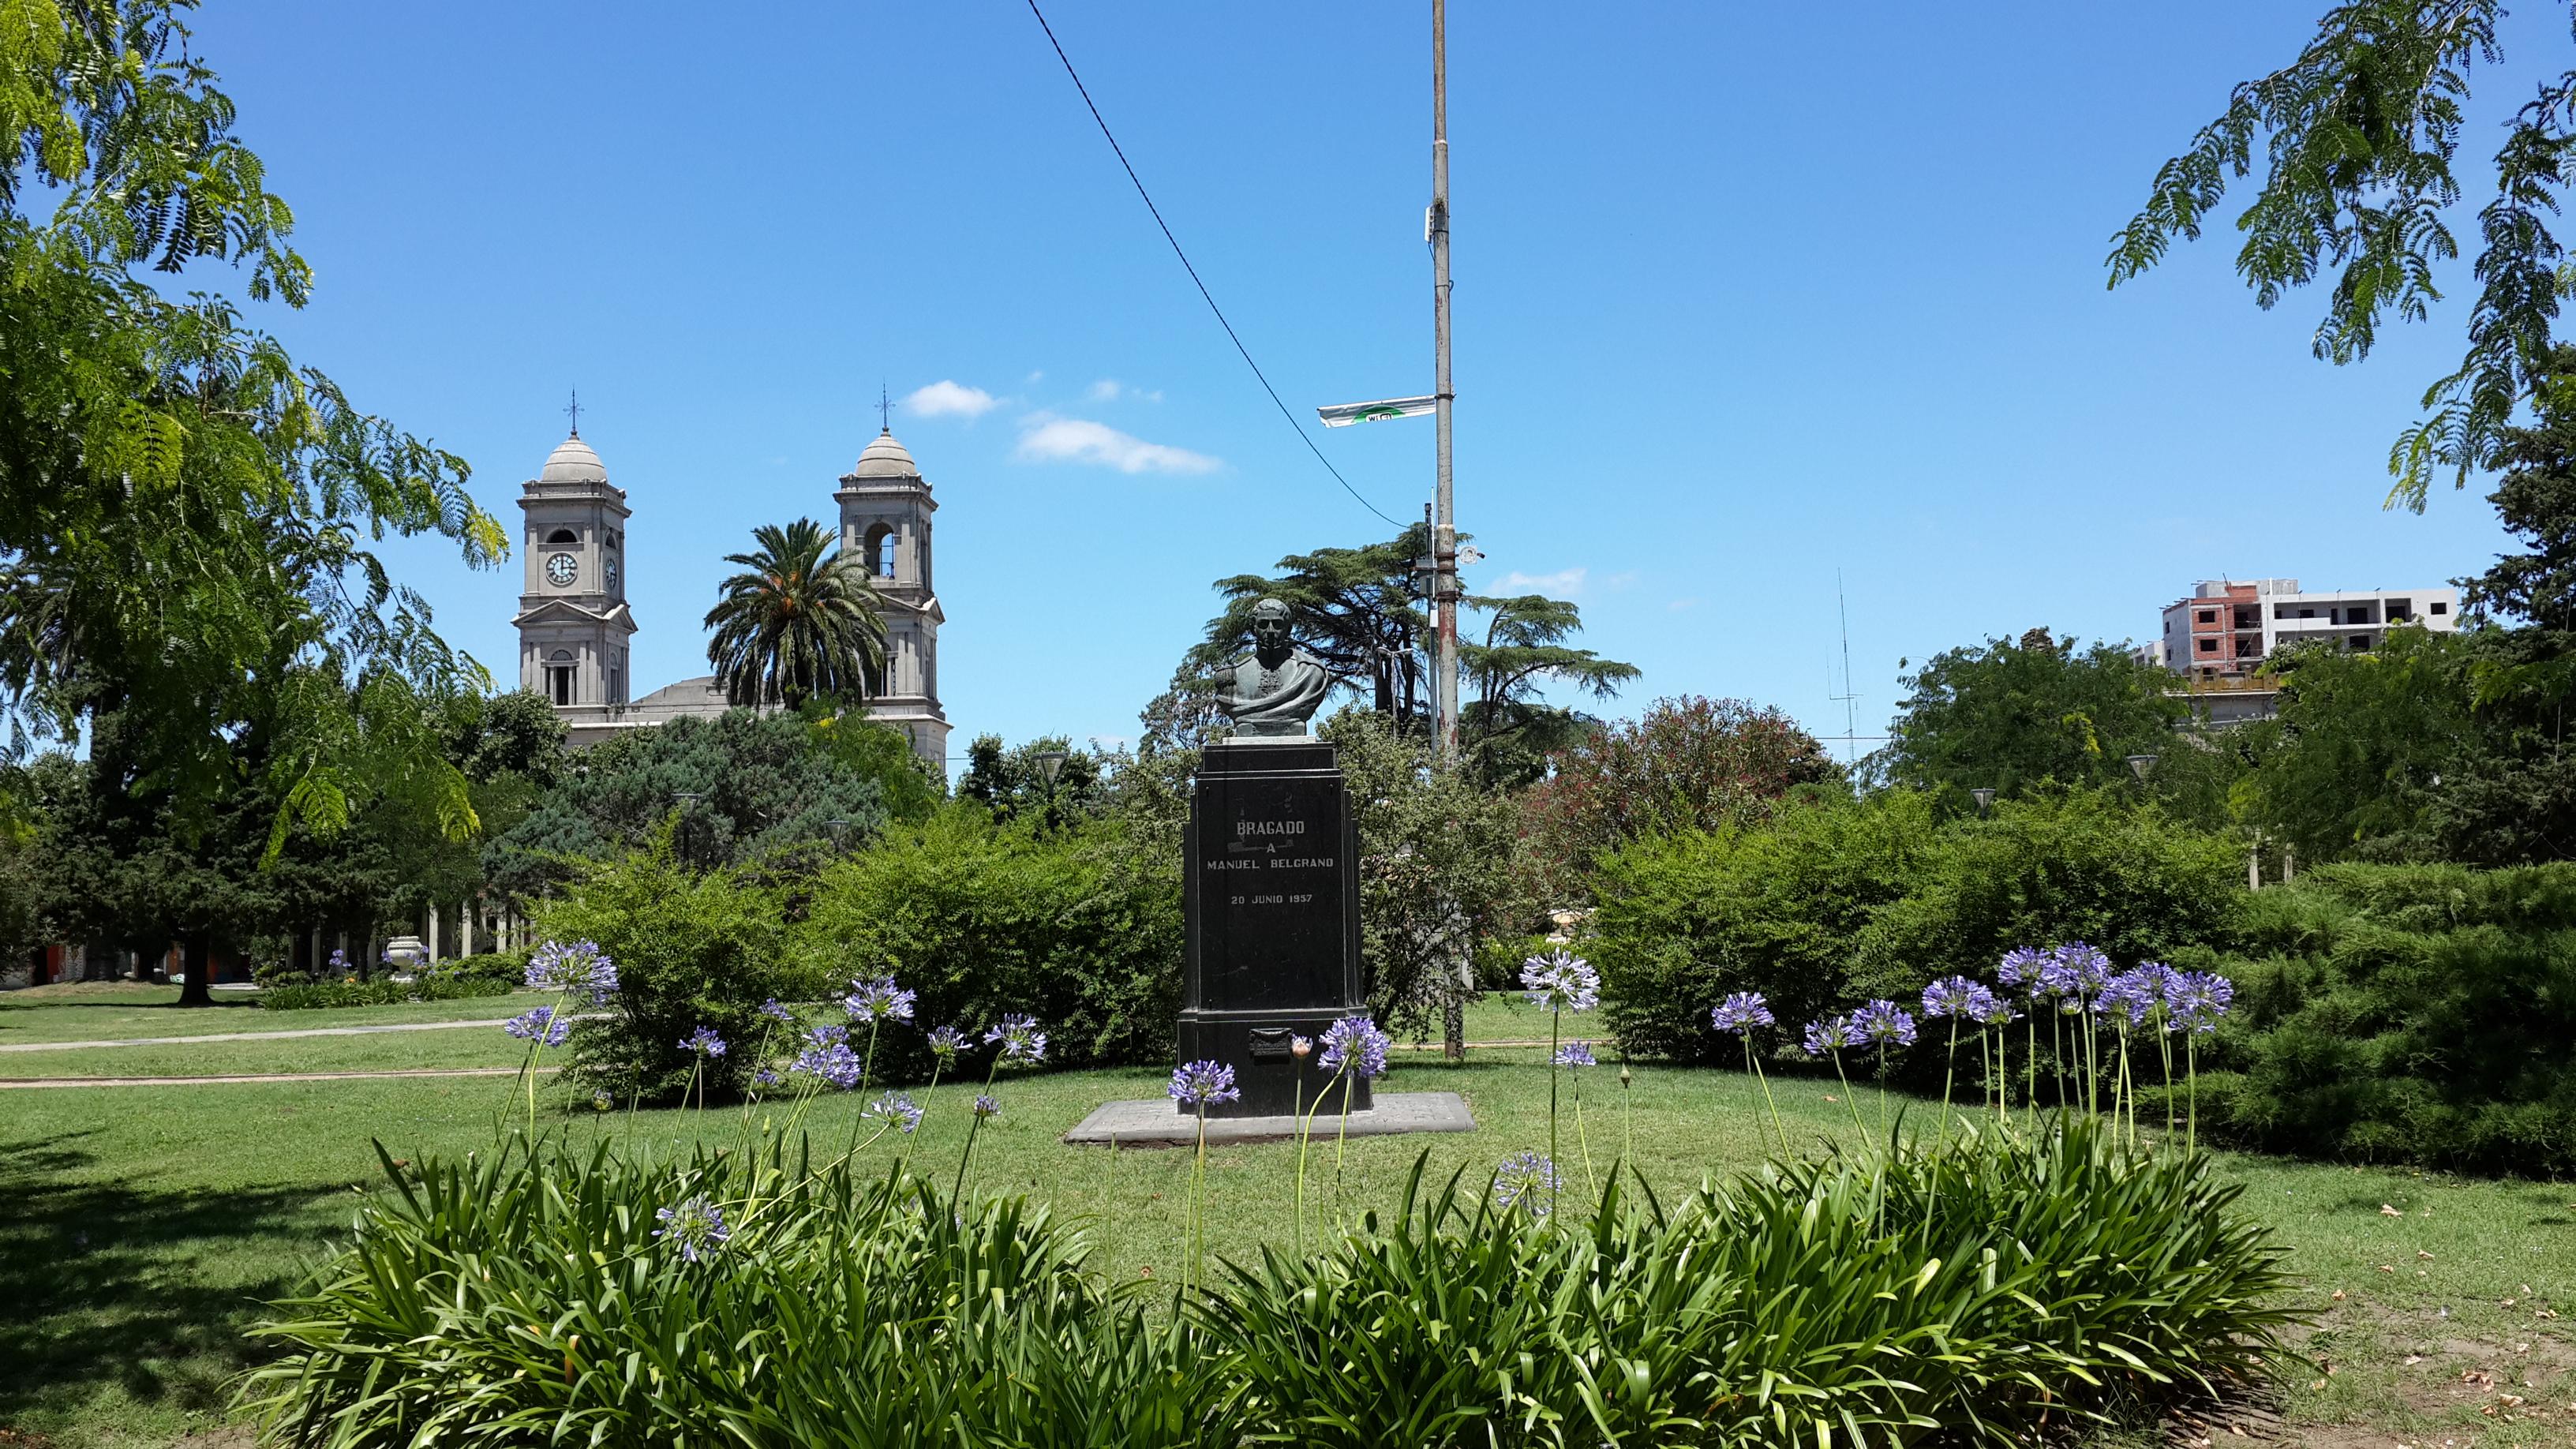 File:Plaza 25 De Mayo De Bragado